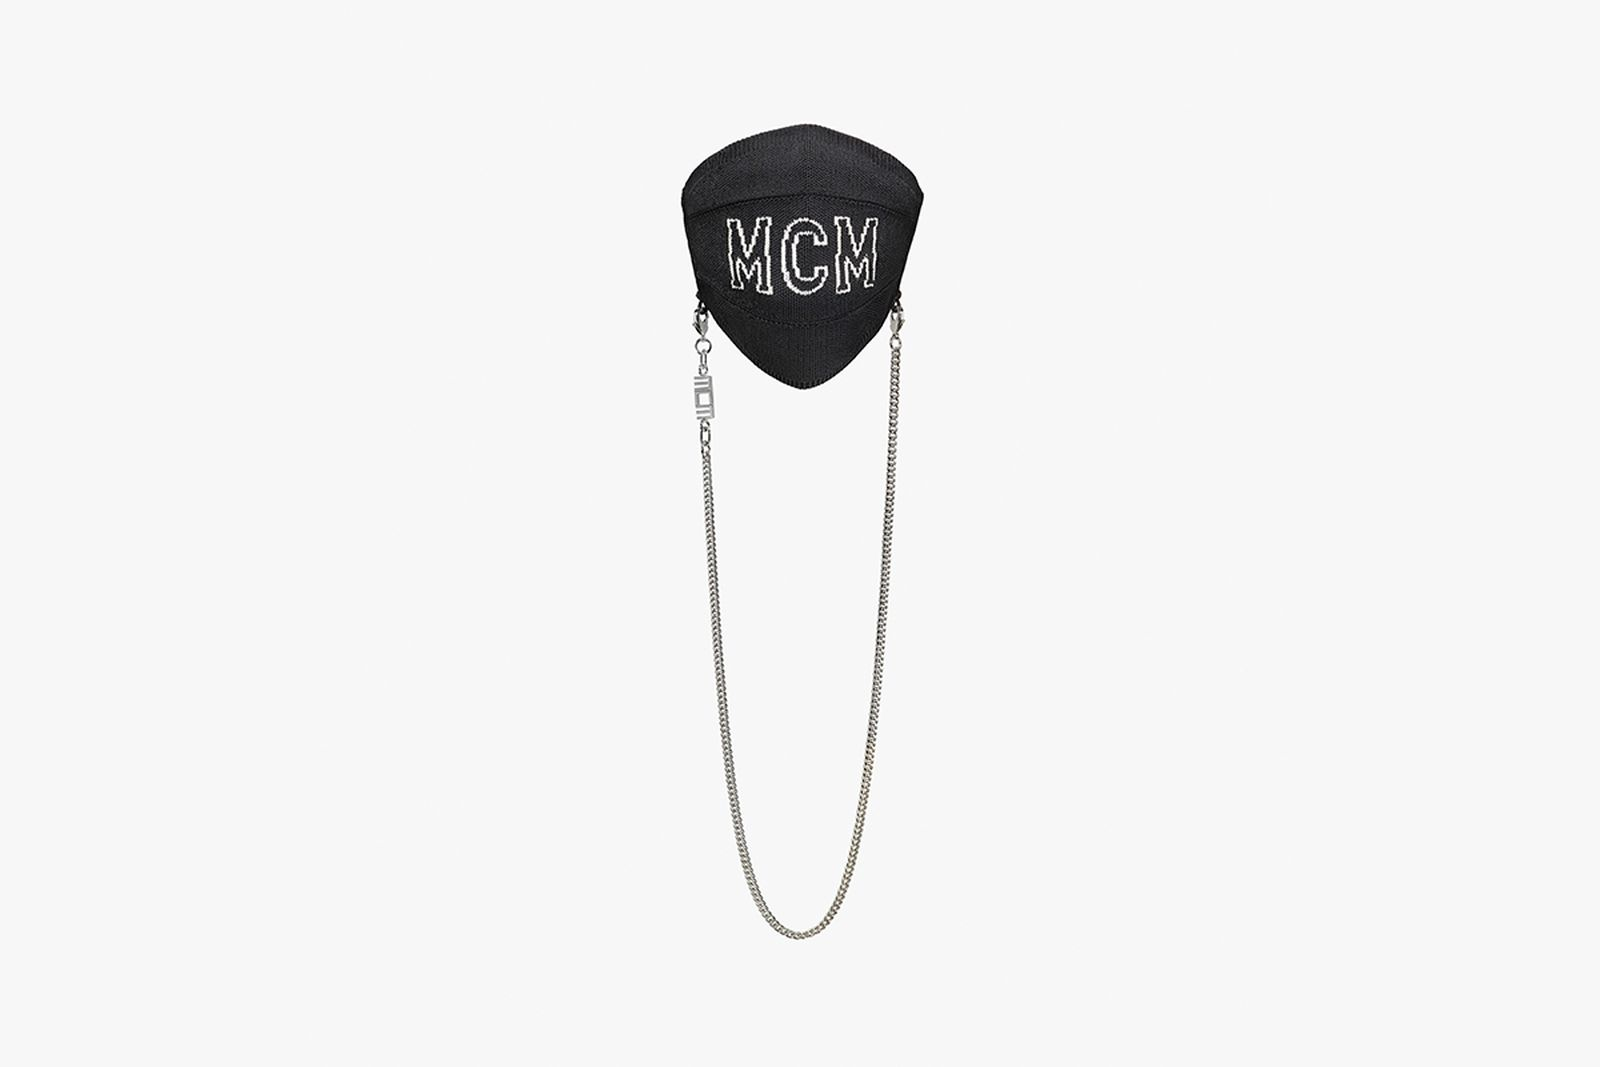 mcm-loungewear-06